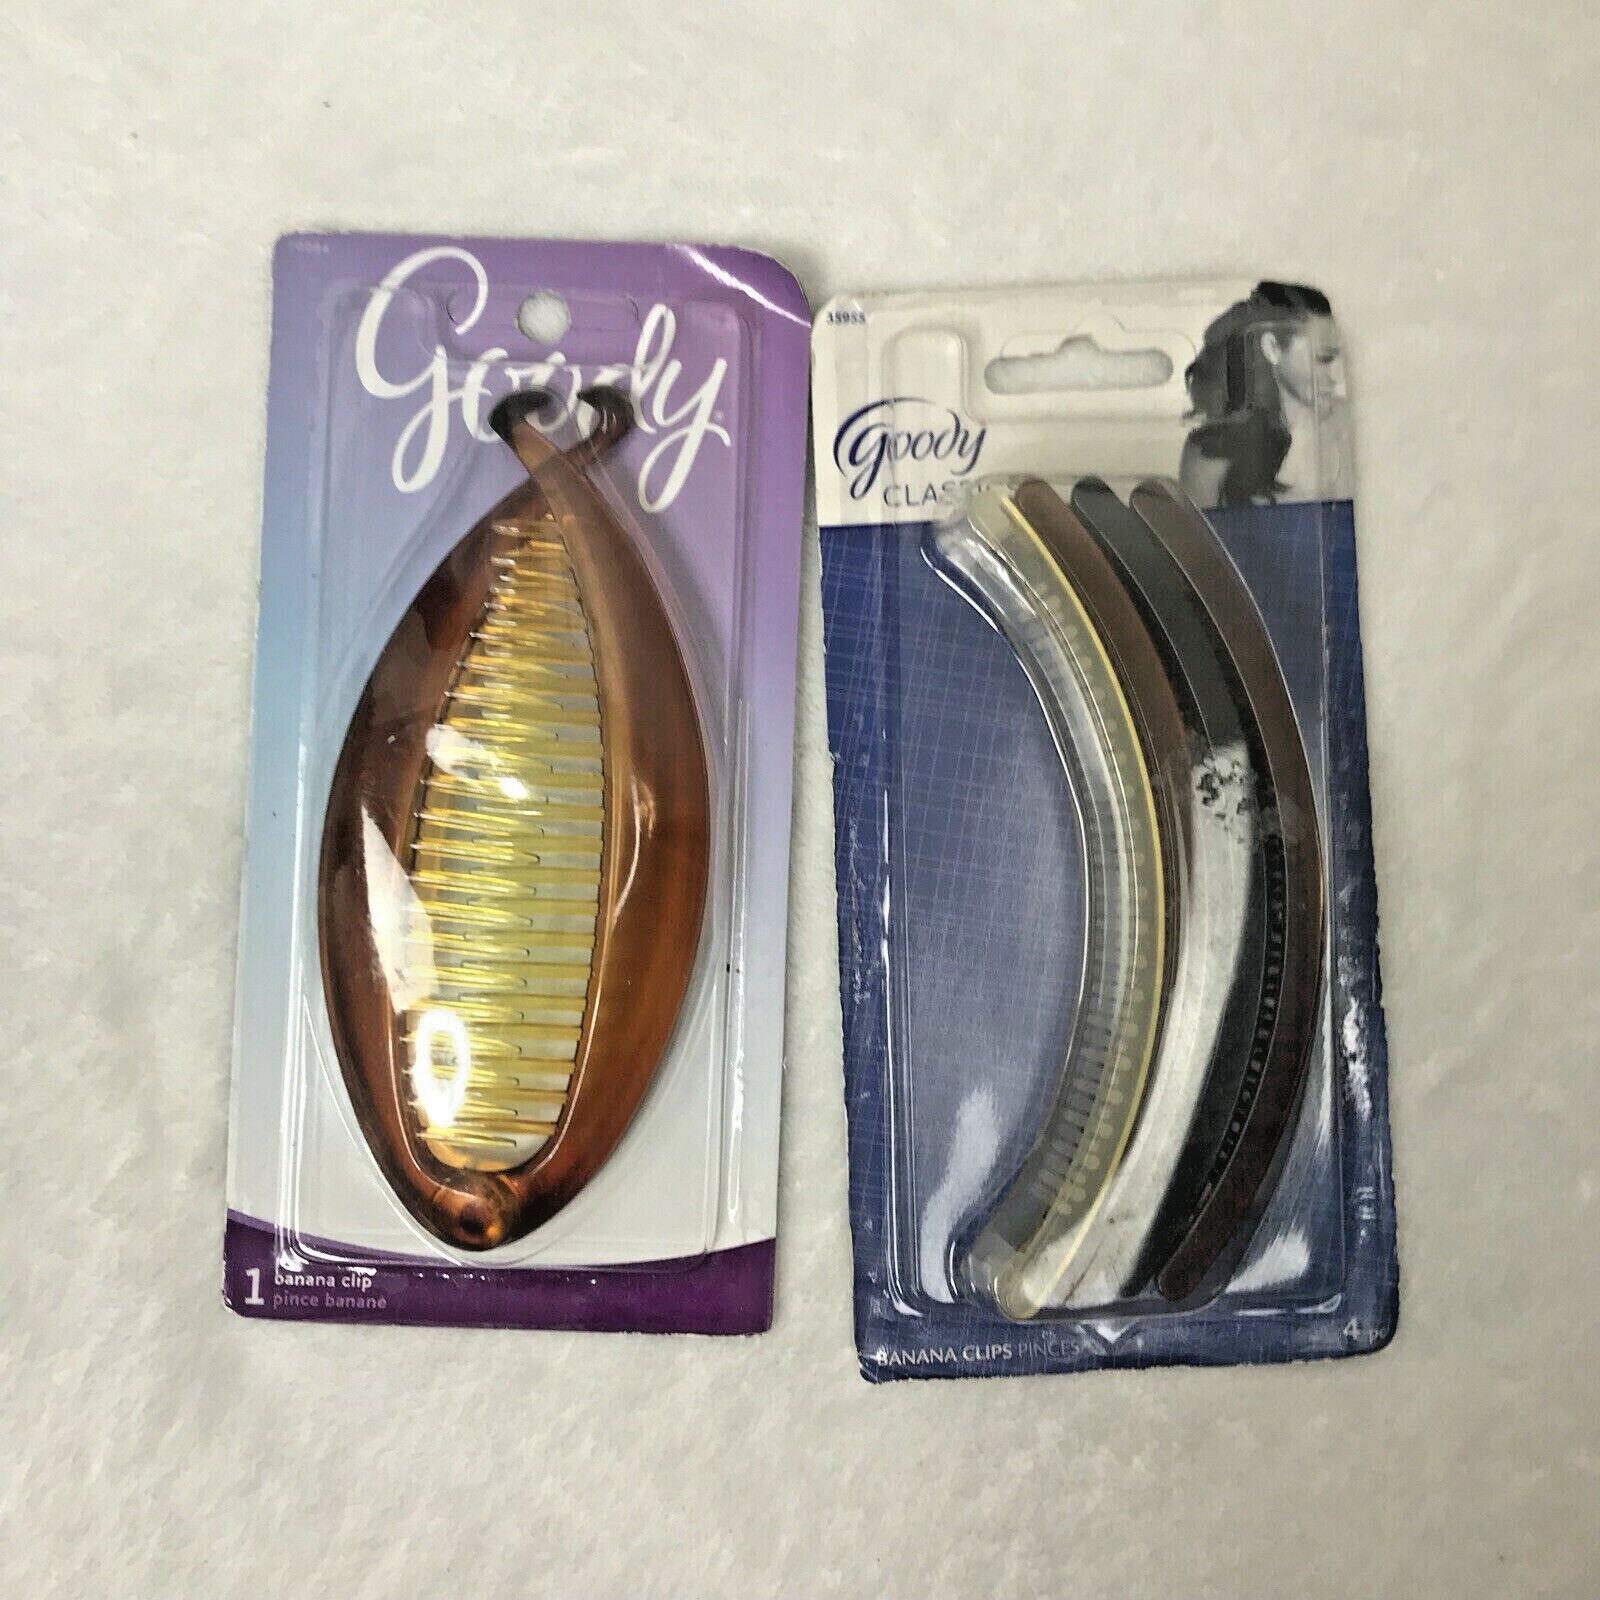 Goody Classics Womens Banana Hair Clips 2 Packs New